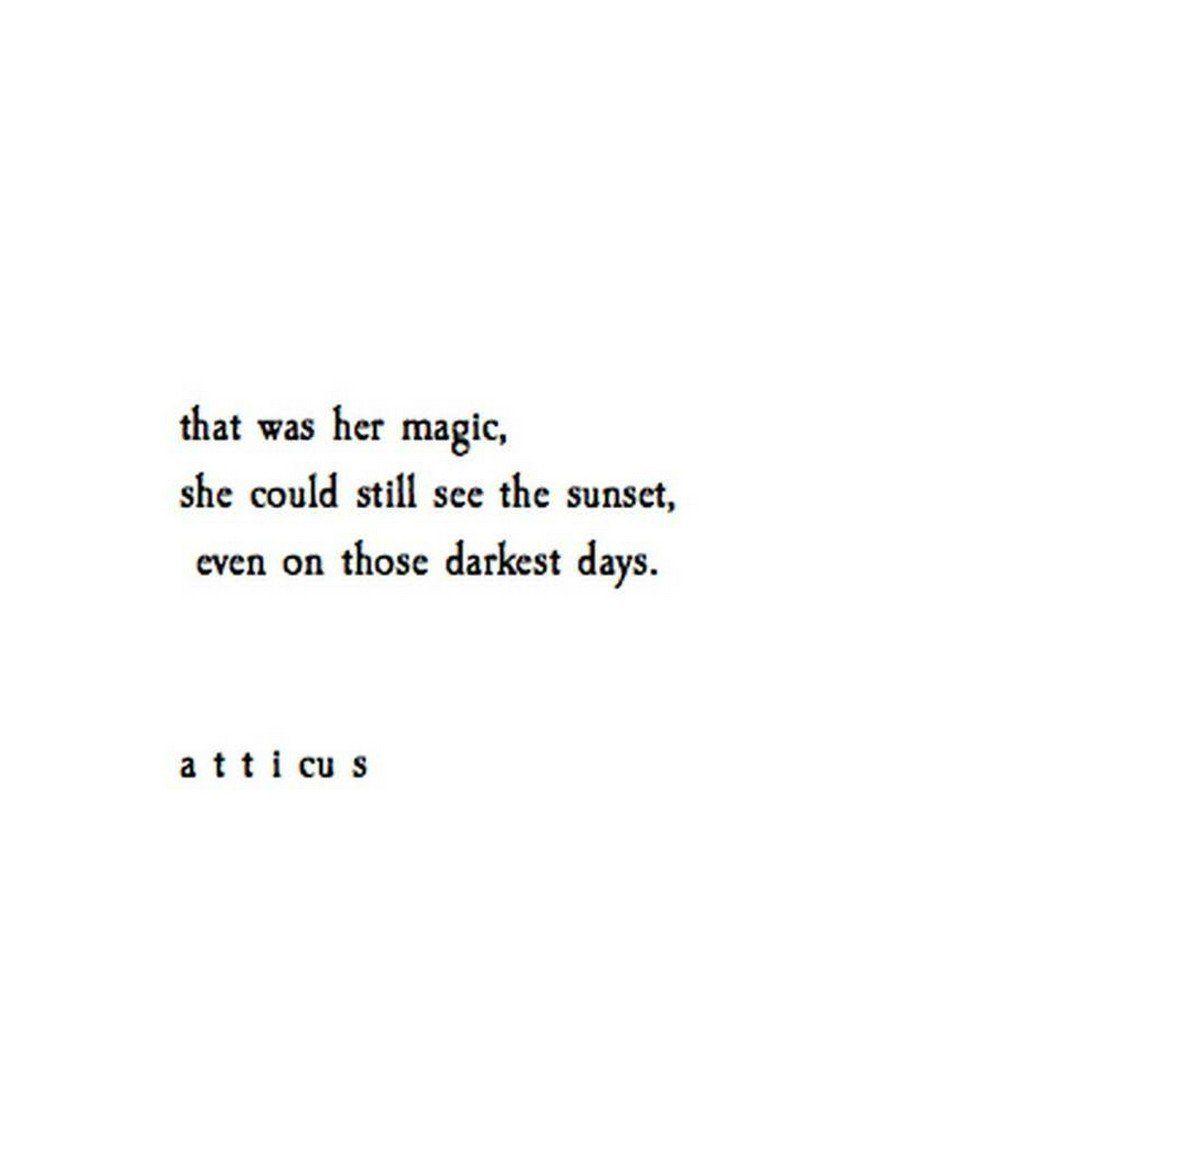 Her Quotes Atticus Poetry Atticuspoetry  Twitter  Poetry  Pinterest